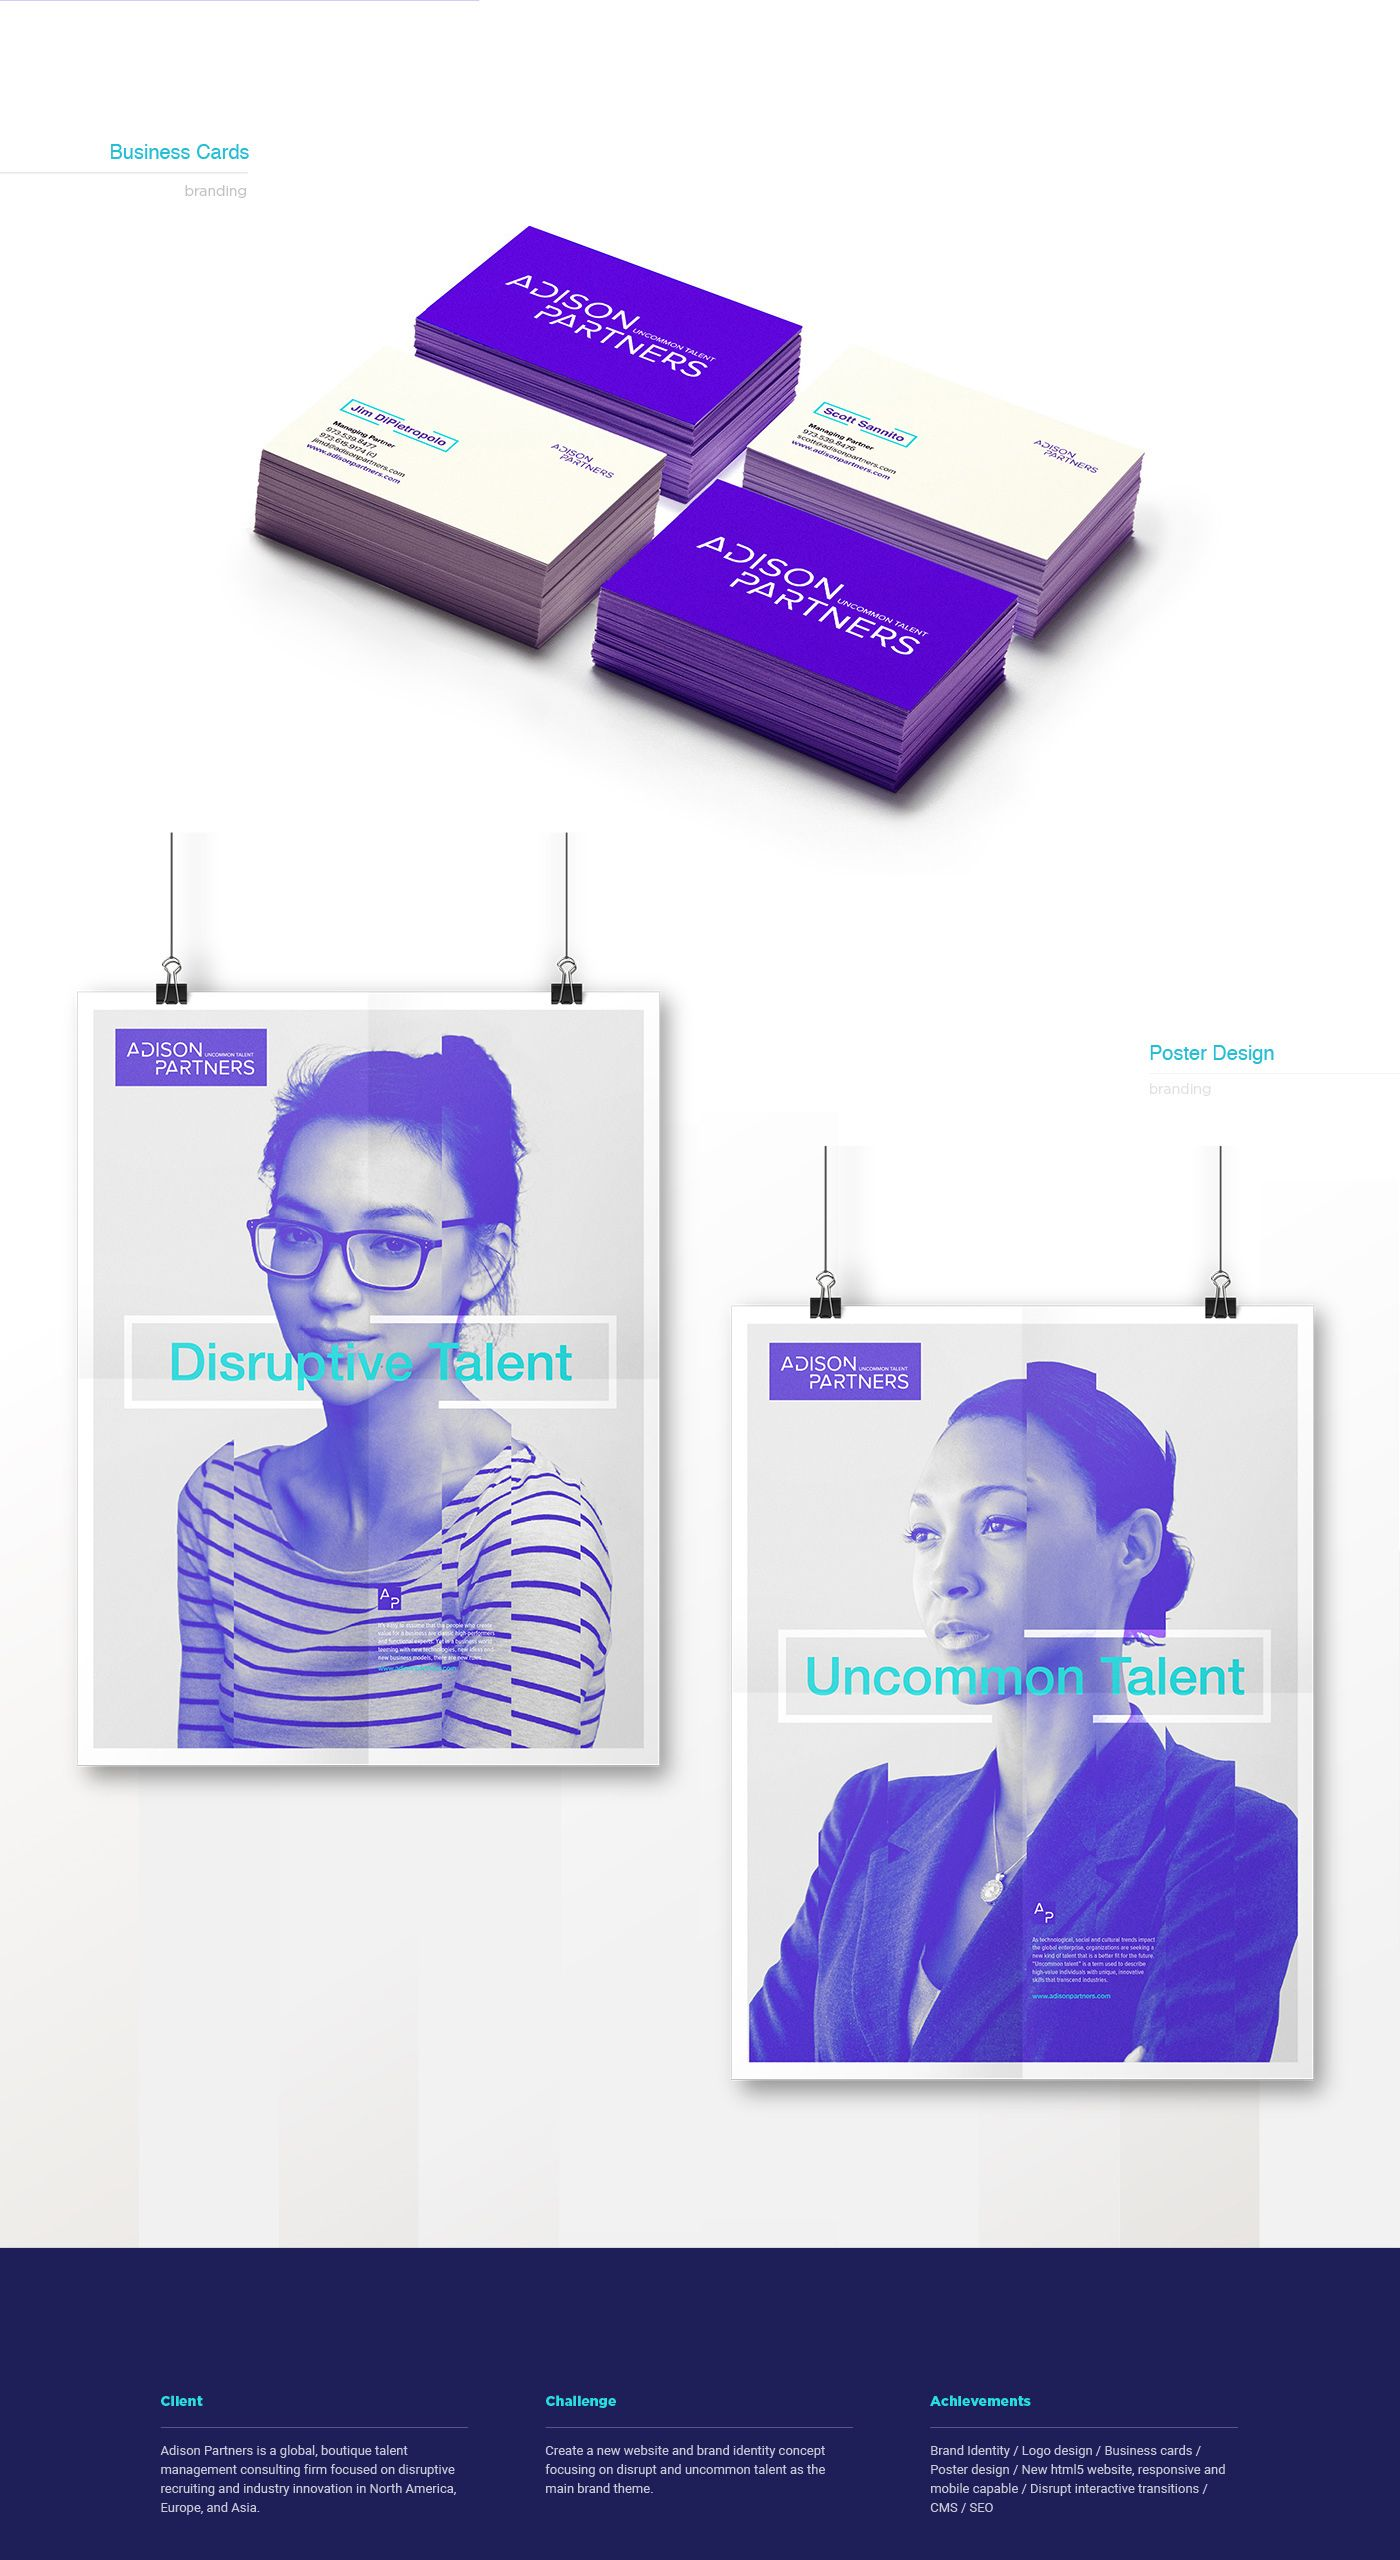 Adison Partners - Branding & Web Design on Behance